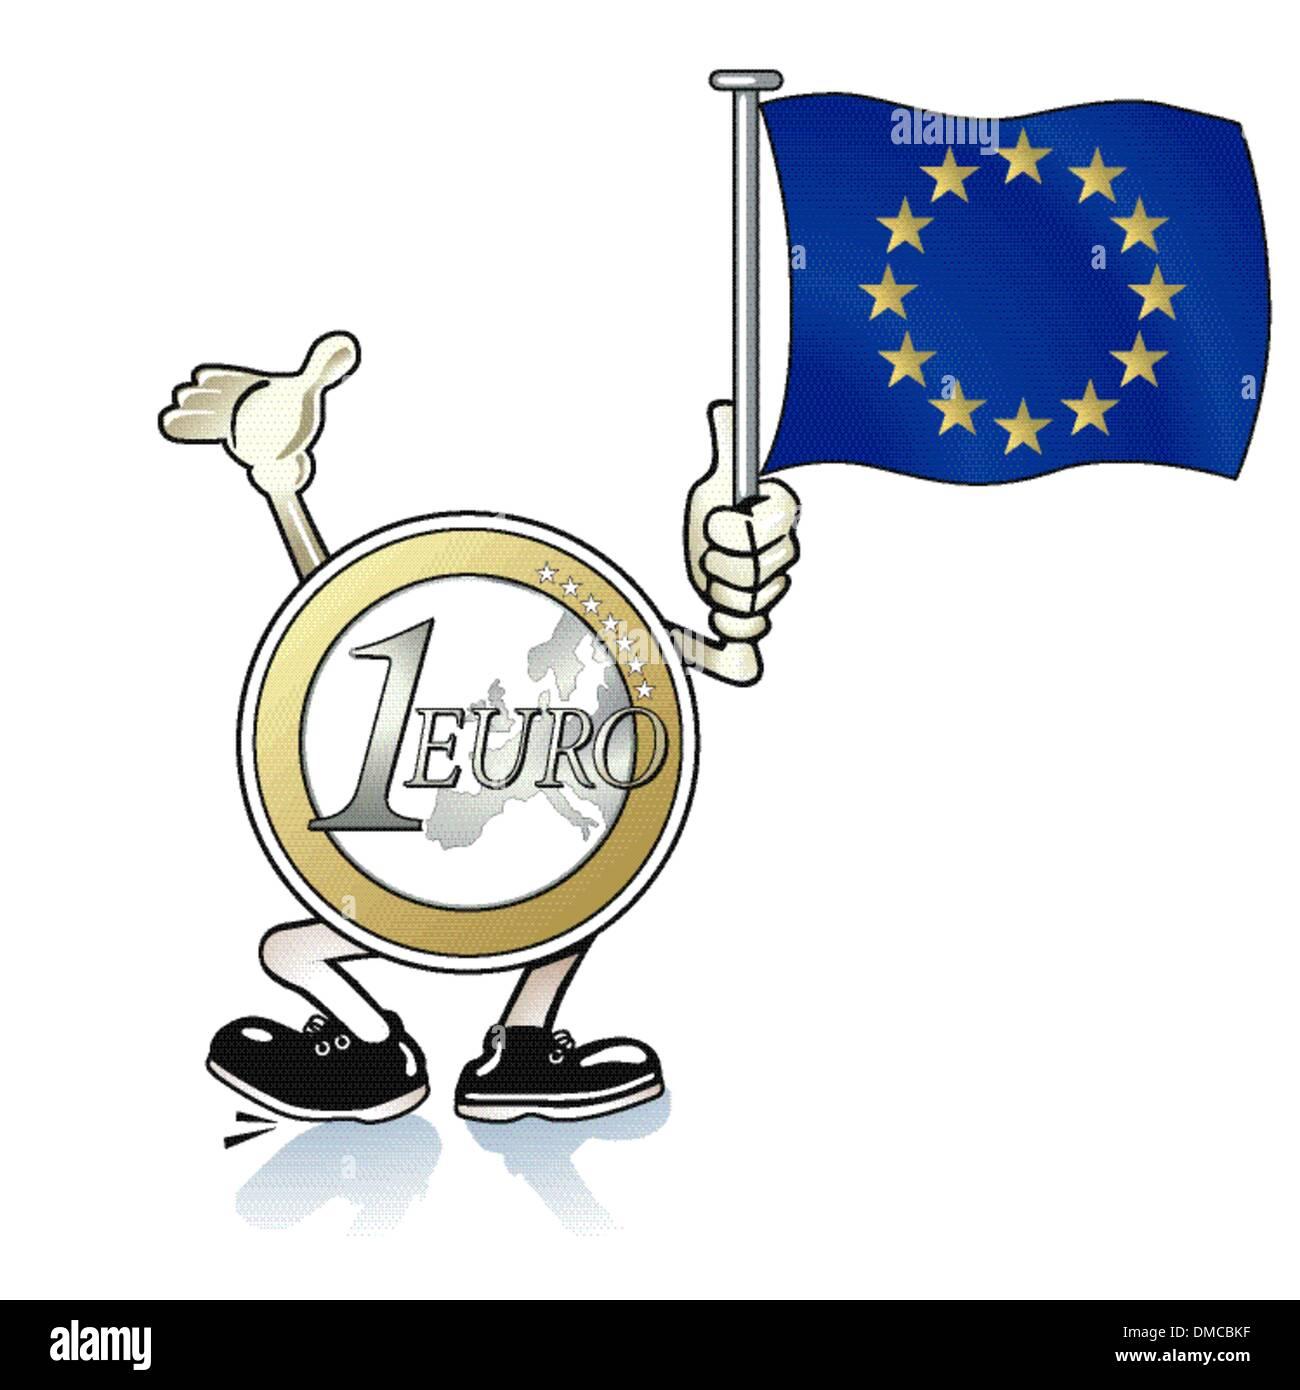 Euro Help - Stock Image